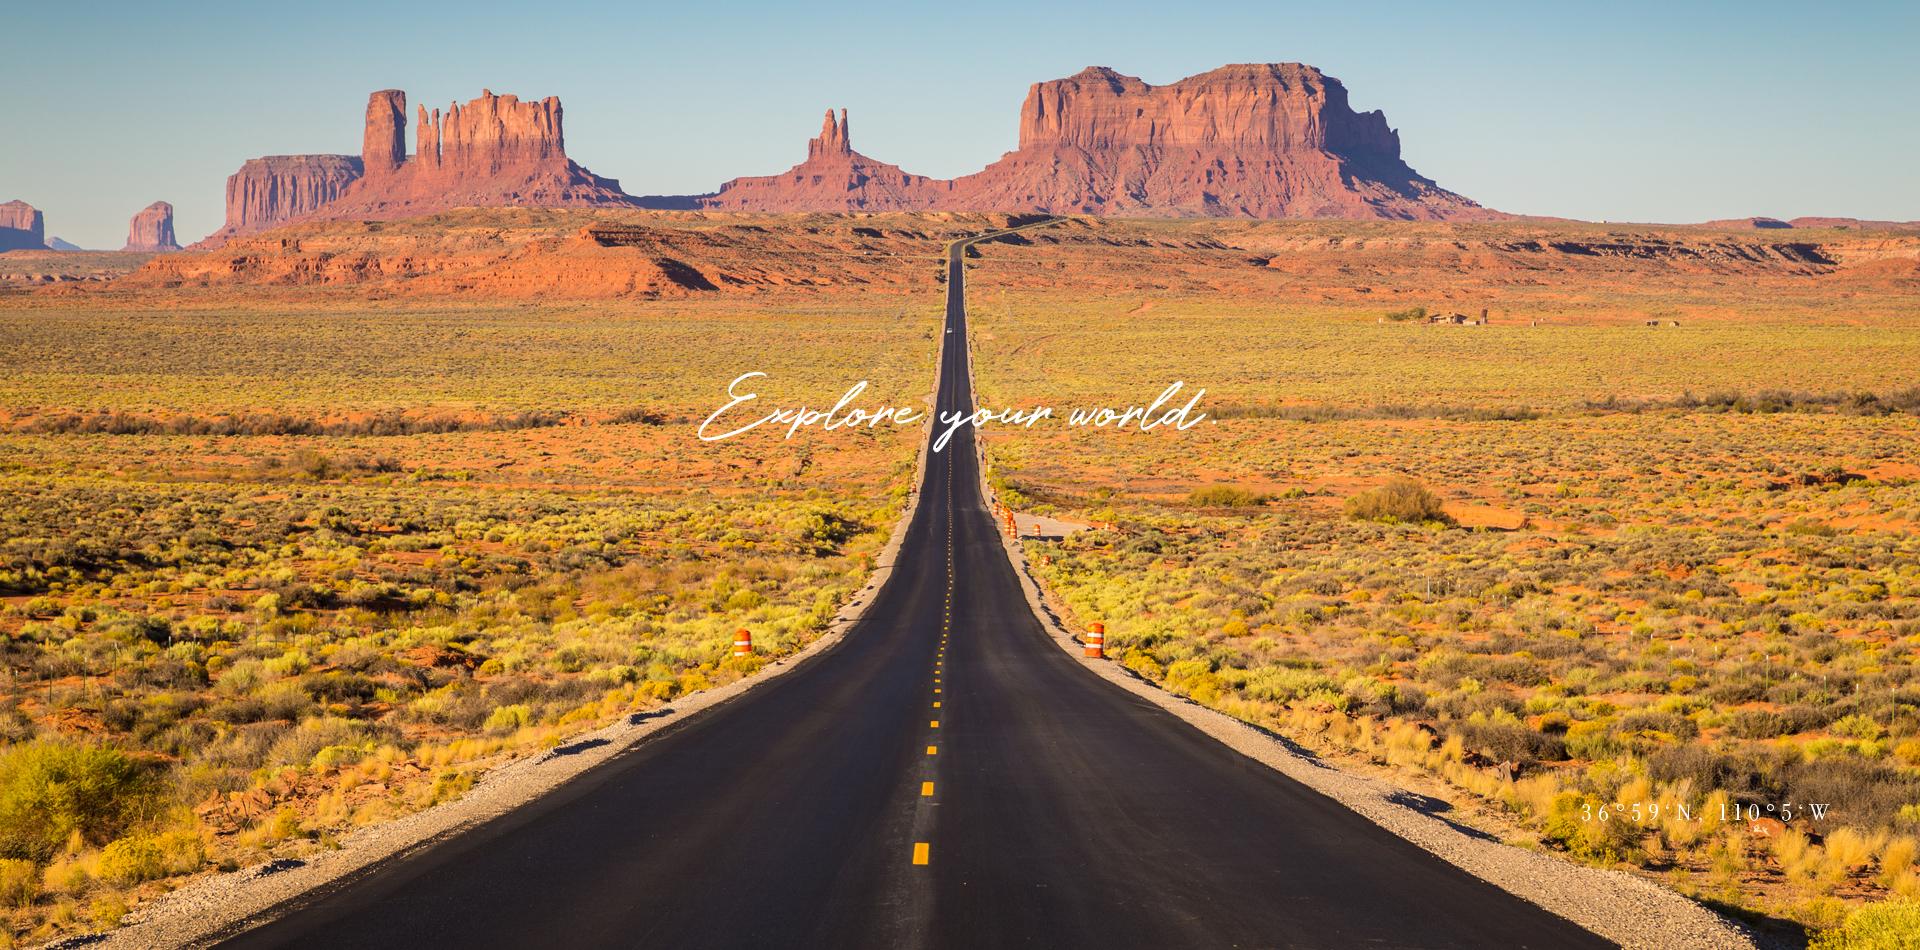 Erlebnisreise Westküste USA